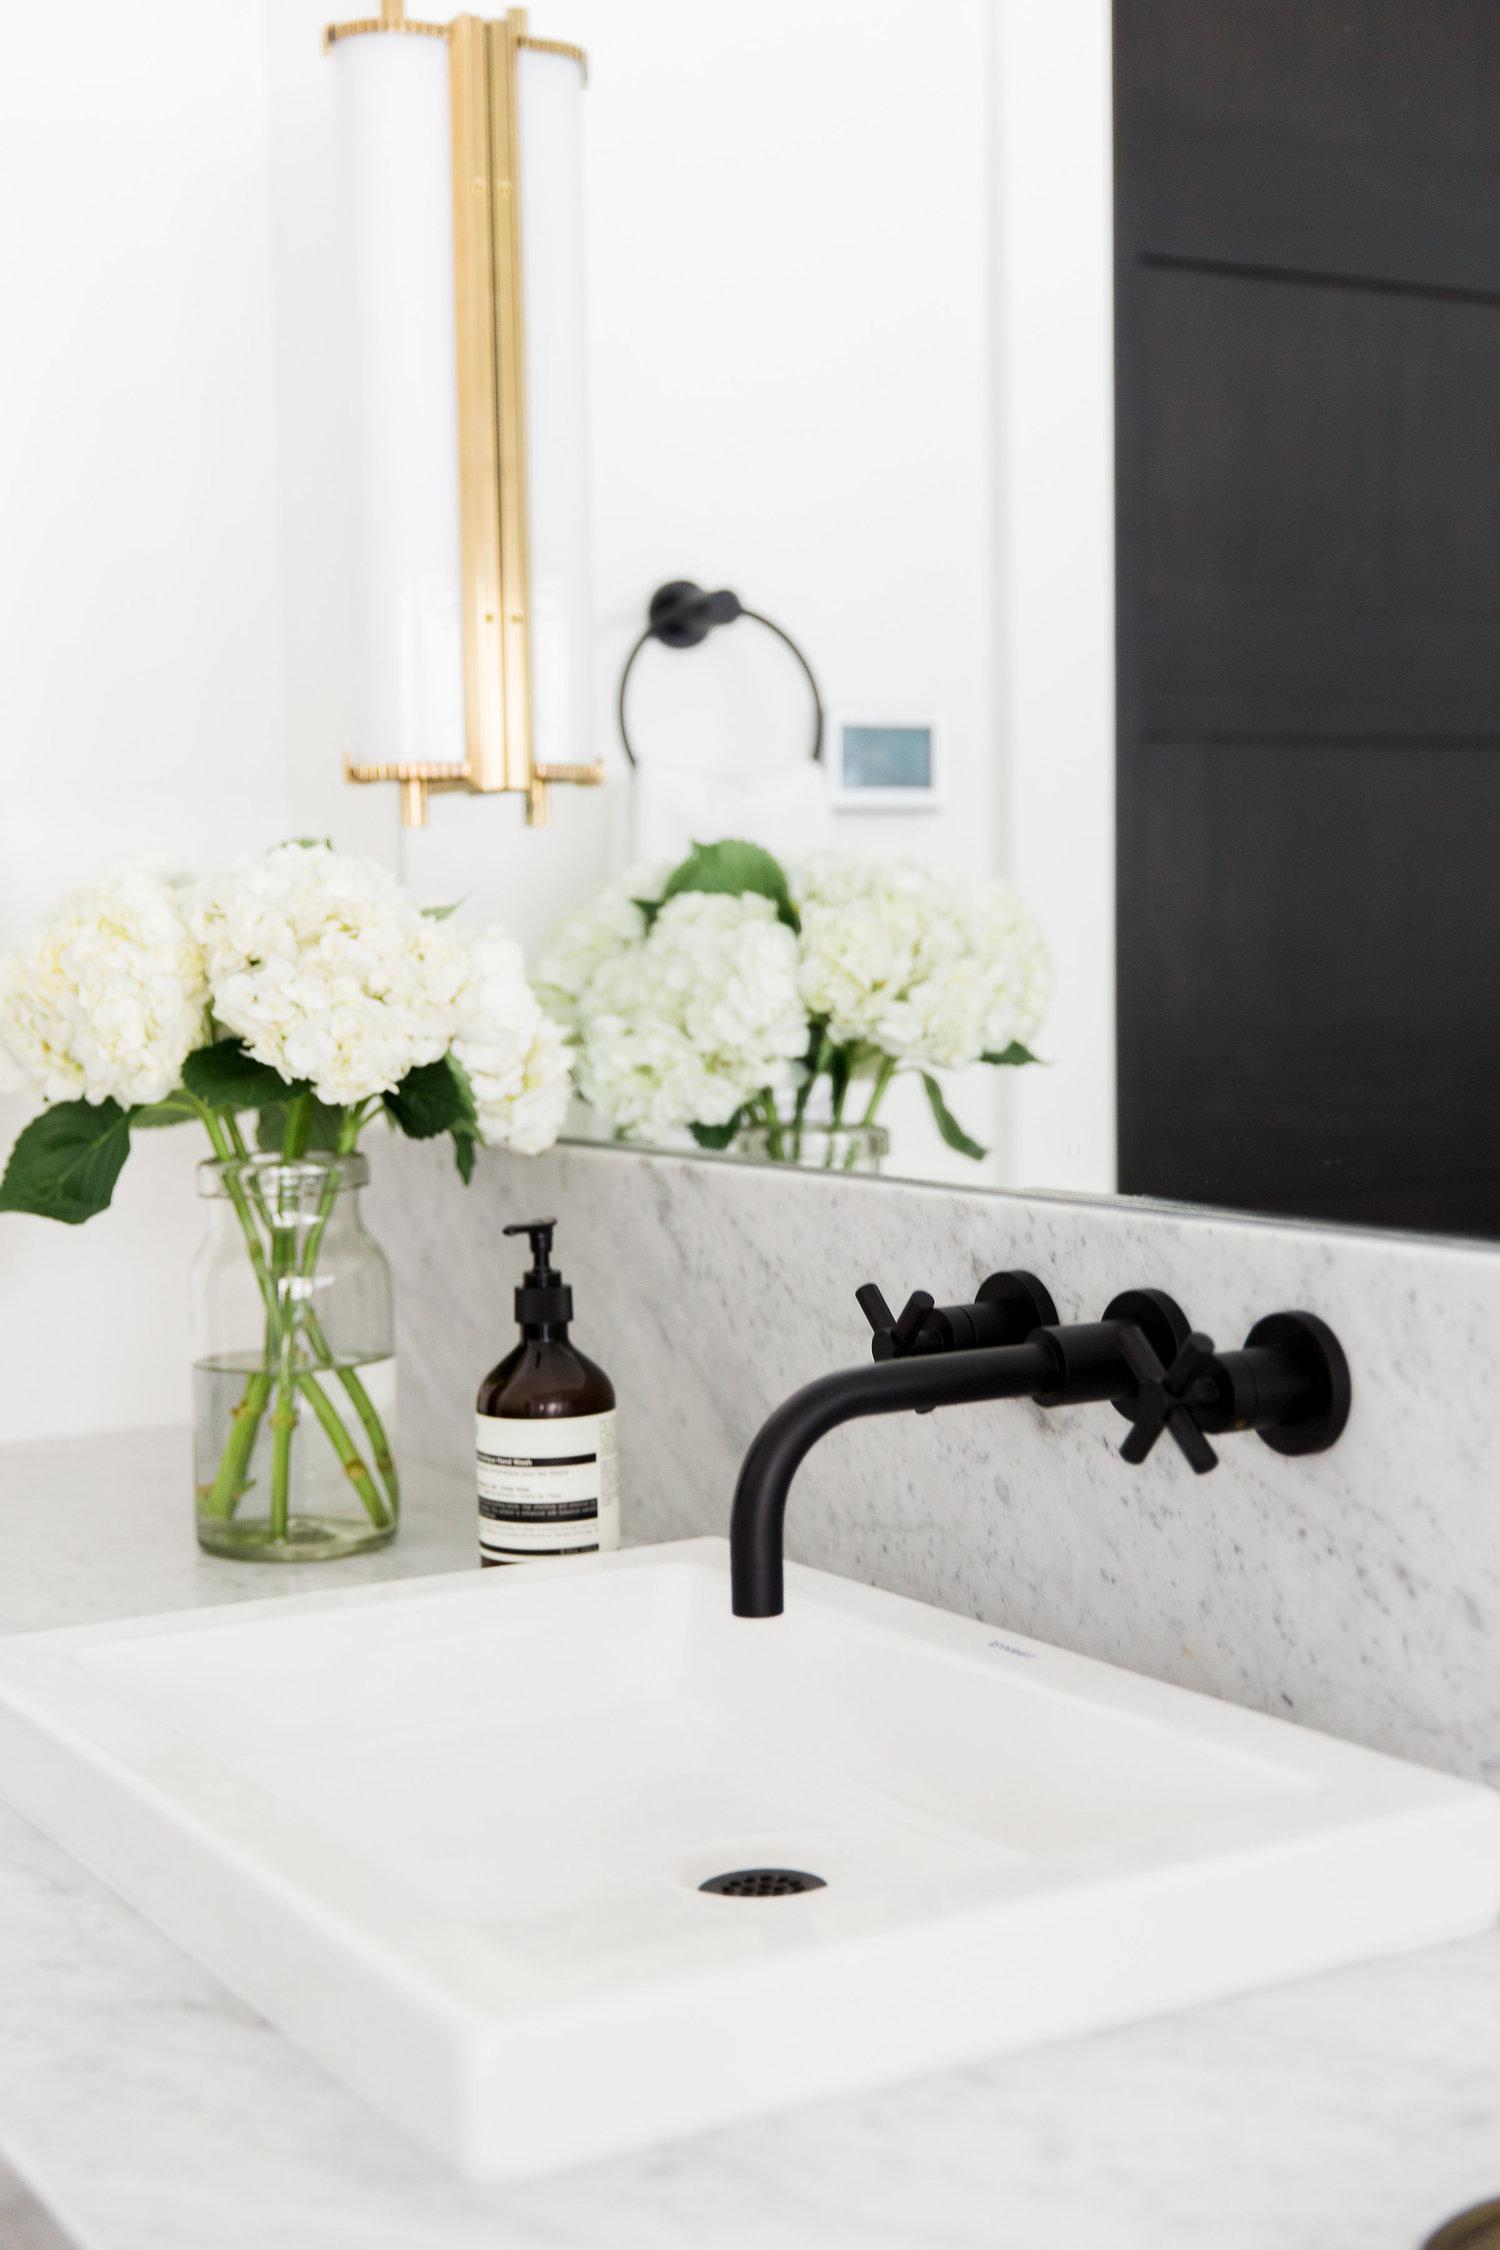 Brushed black faucet above vanity sink